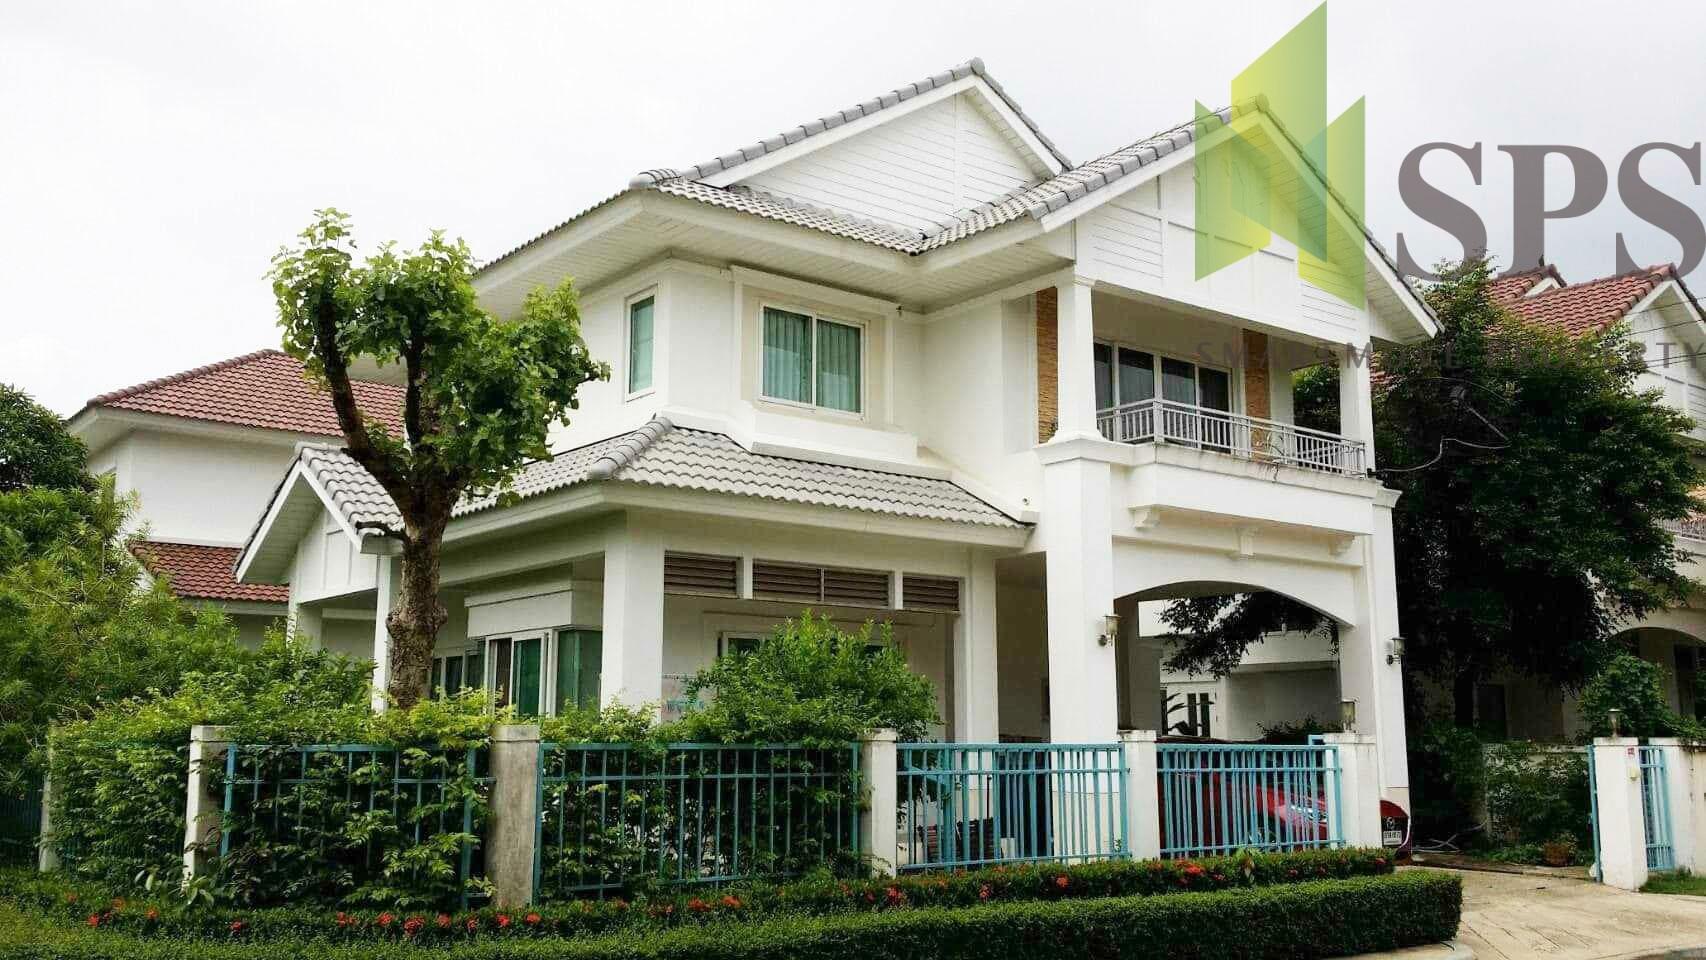 Detached House Perfect Place Ramkhamhaeng 164เพอร์เฟคเพลส รามคำแหง164 (SPS-GH1012)